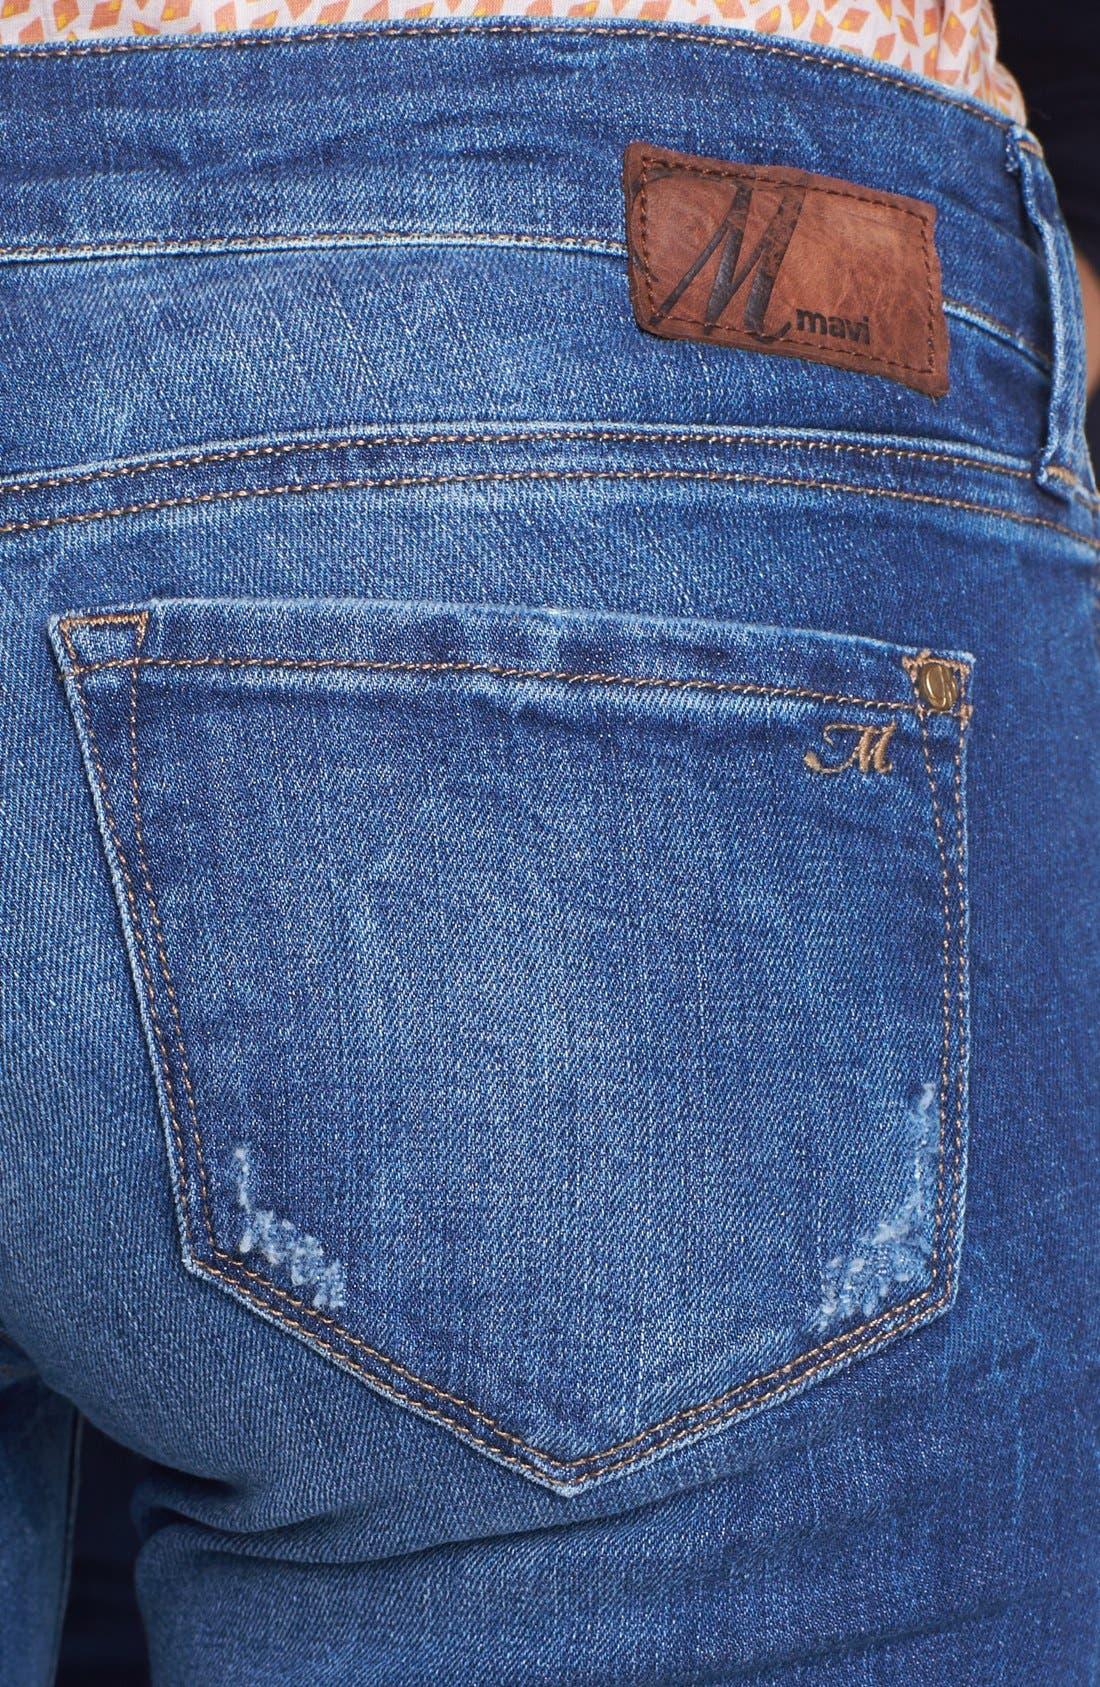 Alternate Image 2  - Mavi Jeans 'Serena' Super Skinny Jeans (Indigo Vintage)